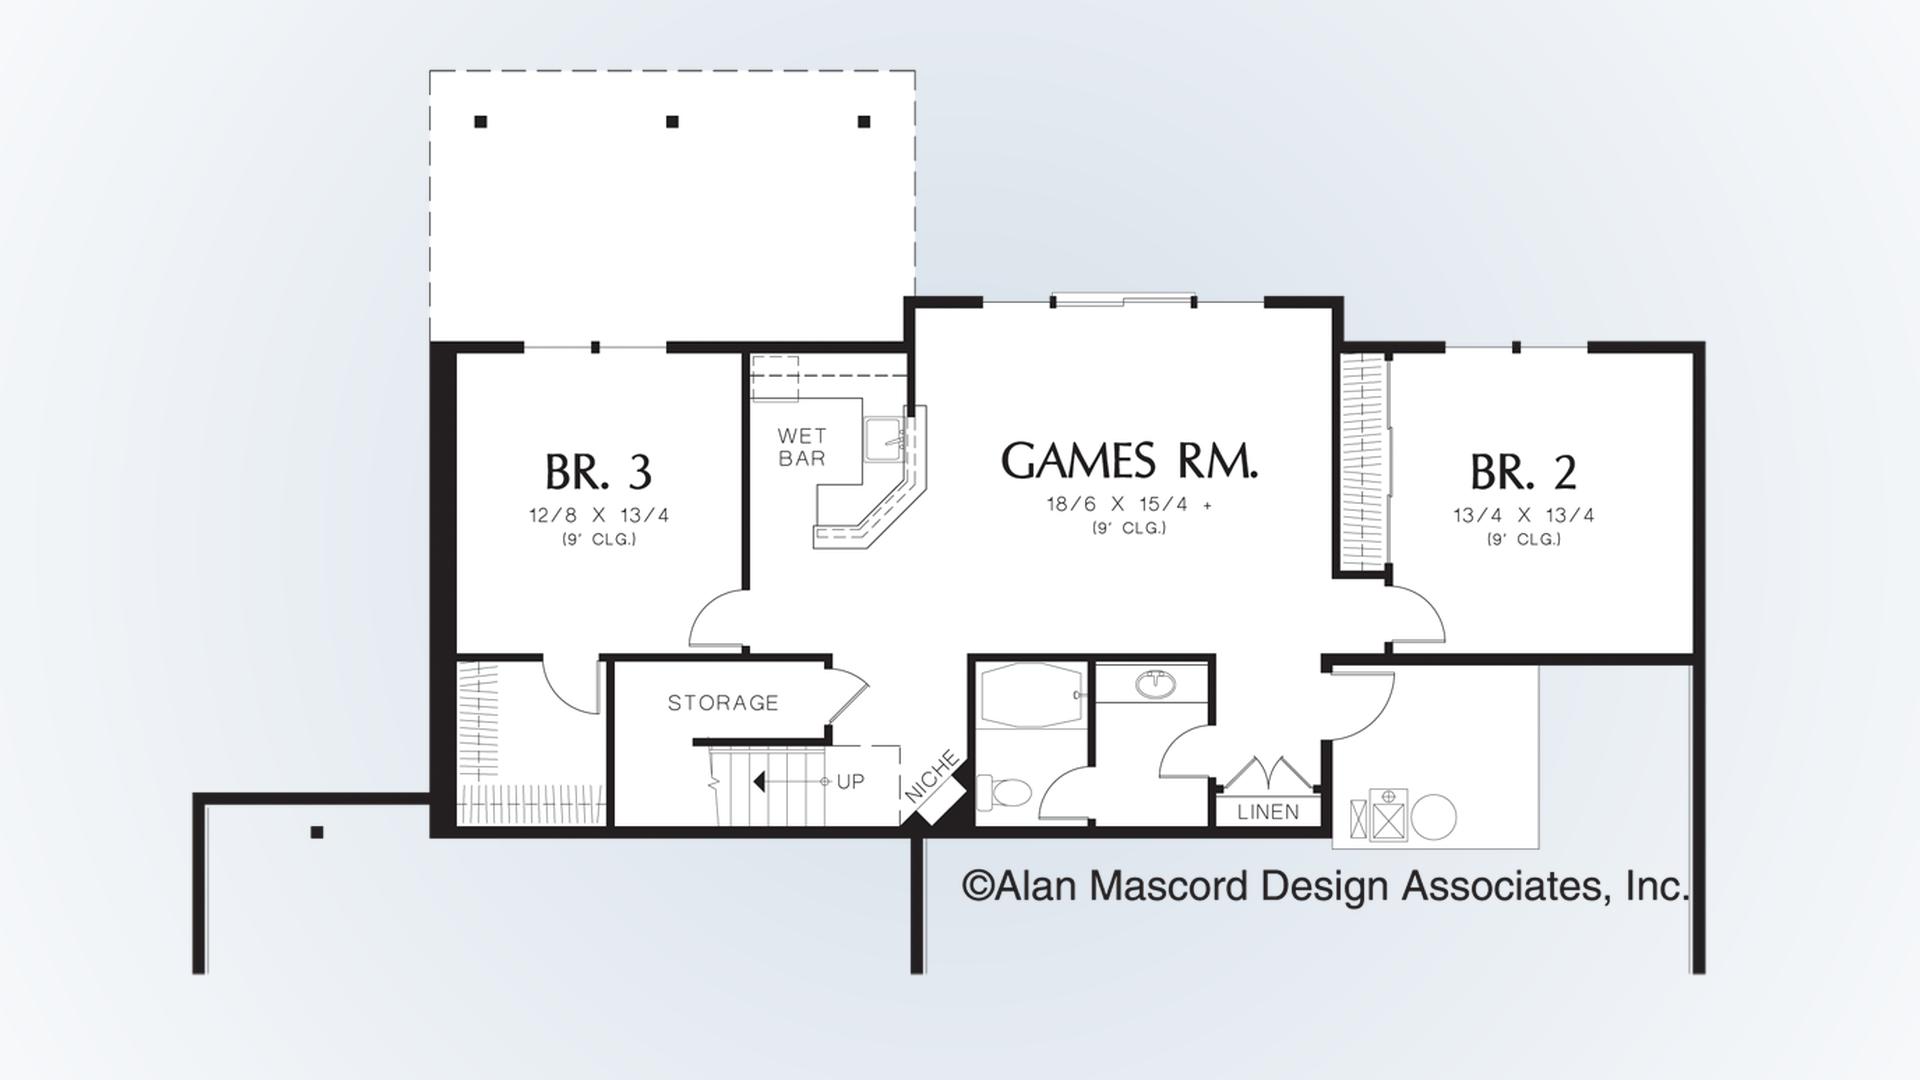 image free Craftsman house plan gd. Drawing storage room